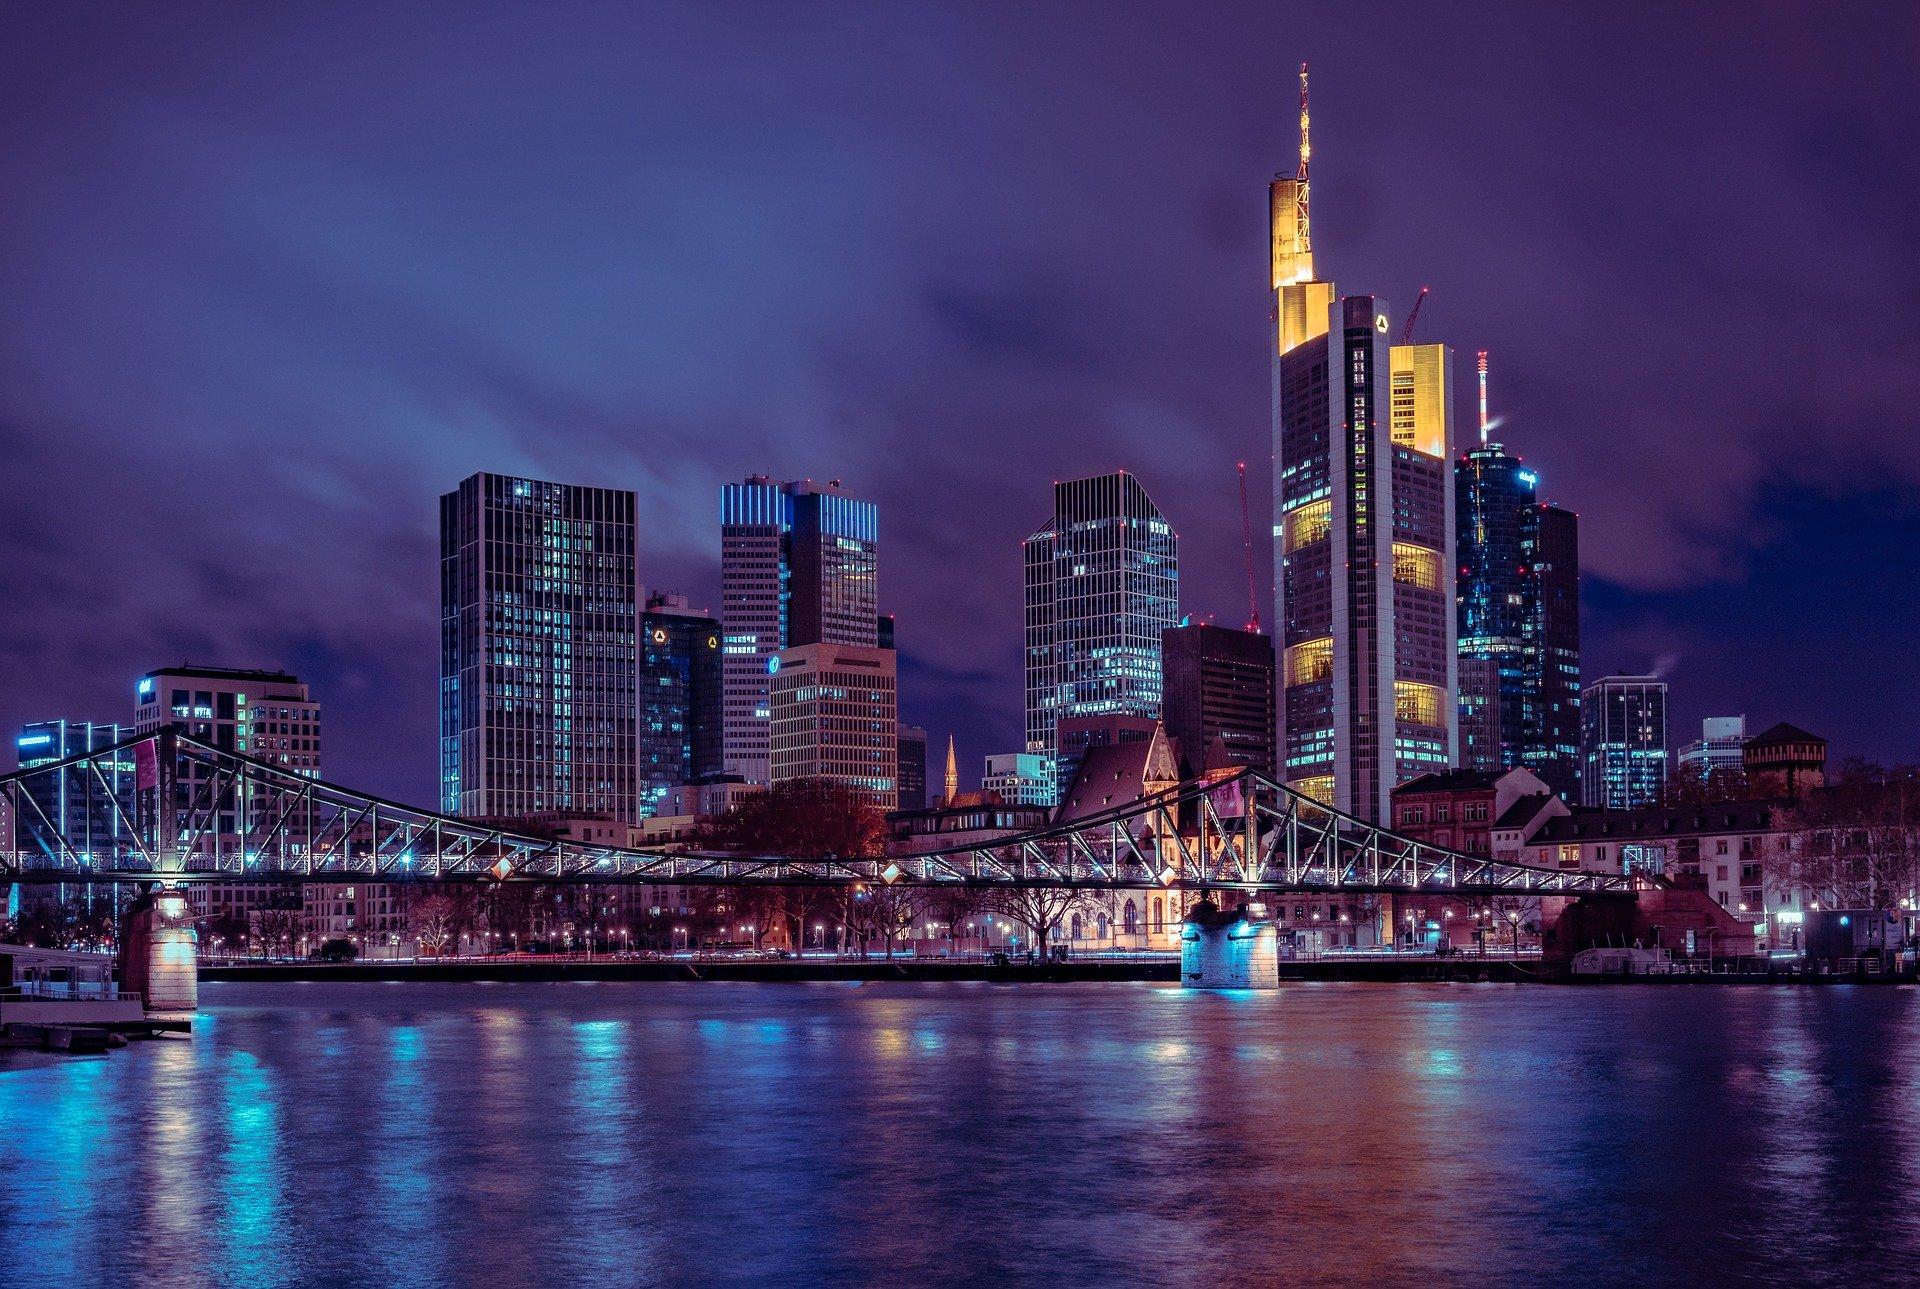 Frankfurt am Main / Pixabay